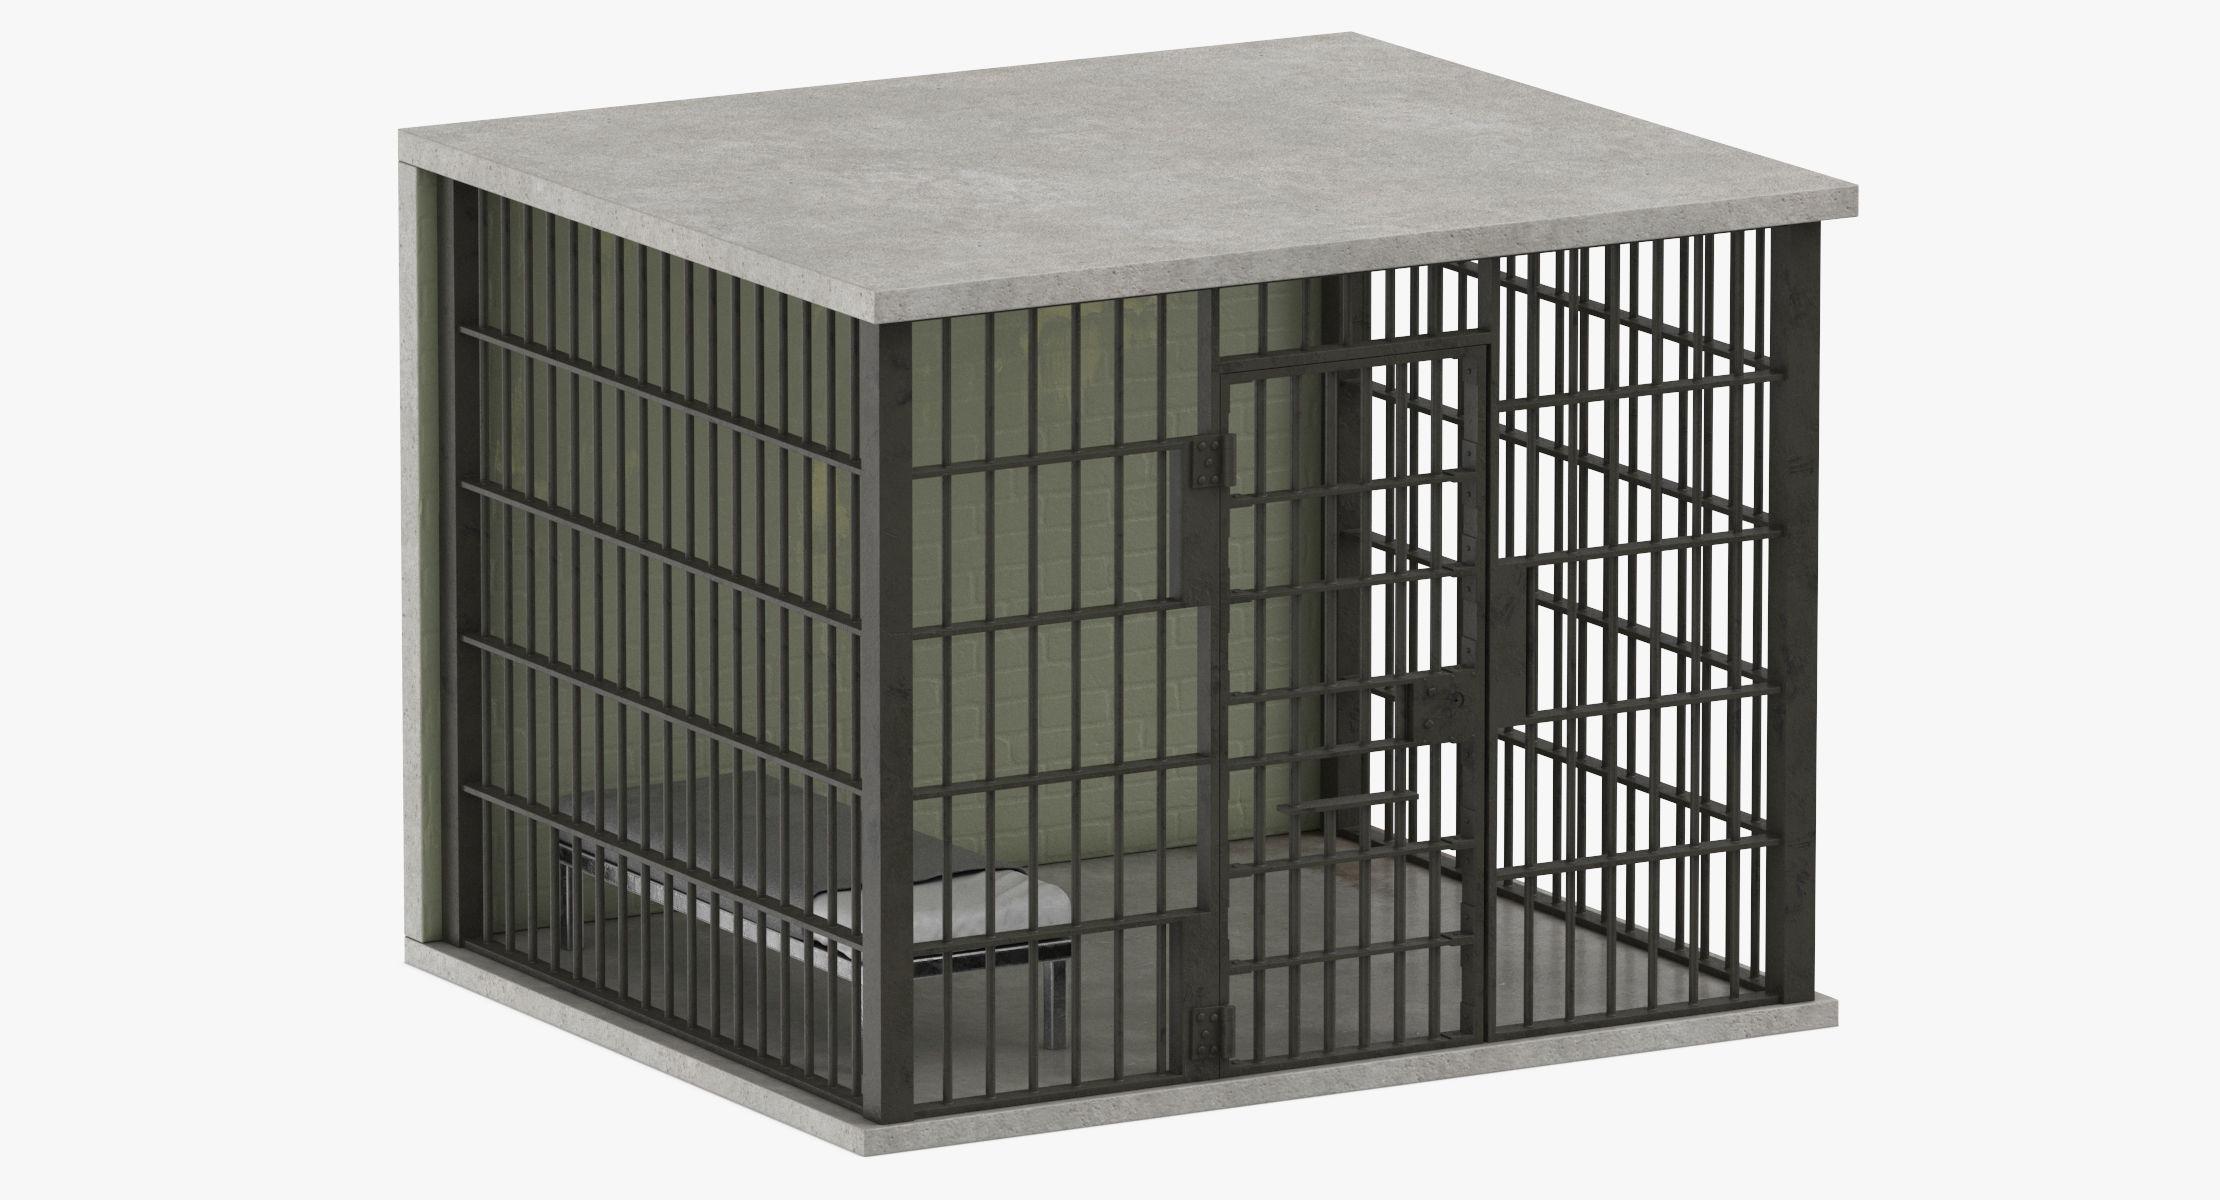 Jail Cell 01 - reel 1